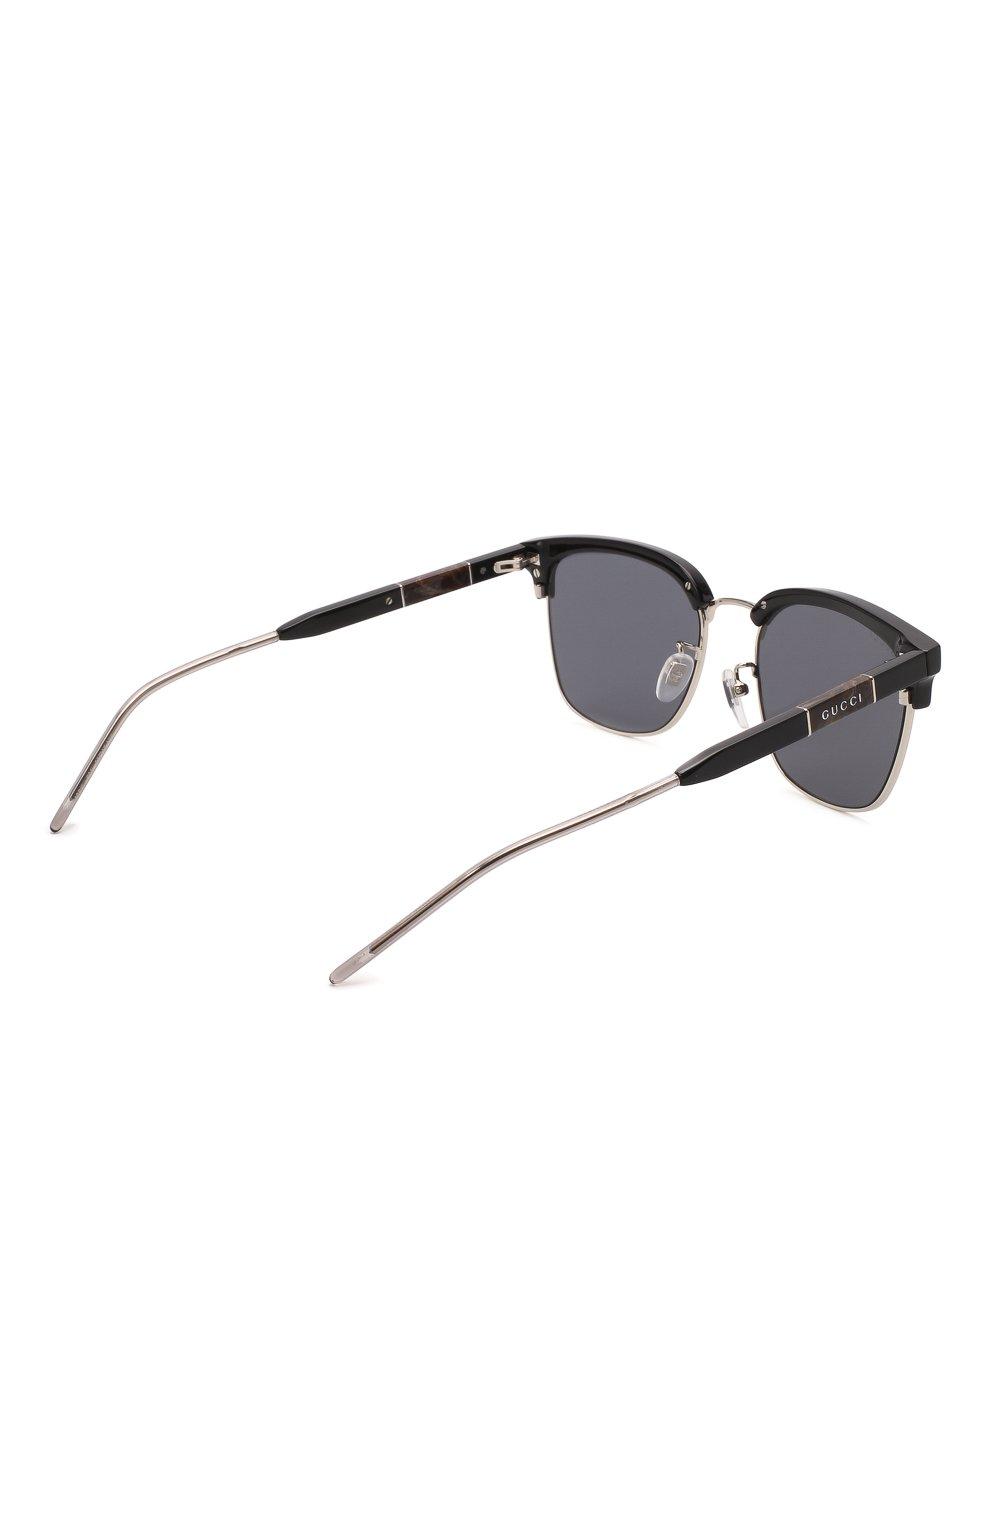 Мужские солнцезащитные очки GUCCI черного цвета, арт. GG0846SK 001 | Фото 4